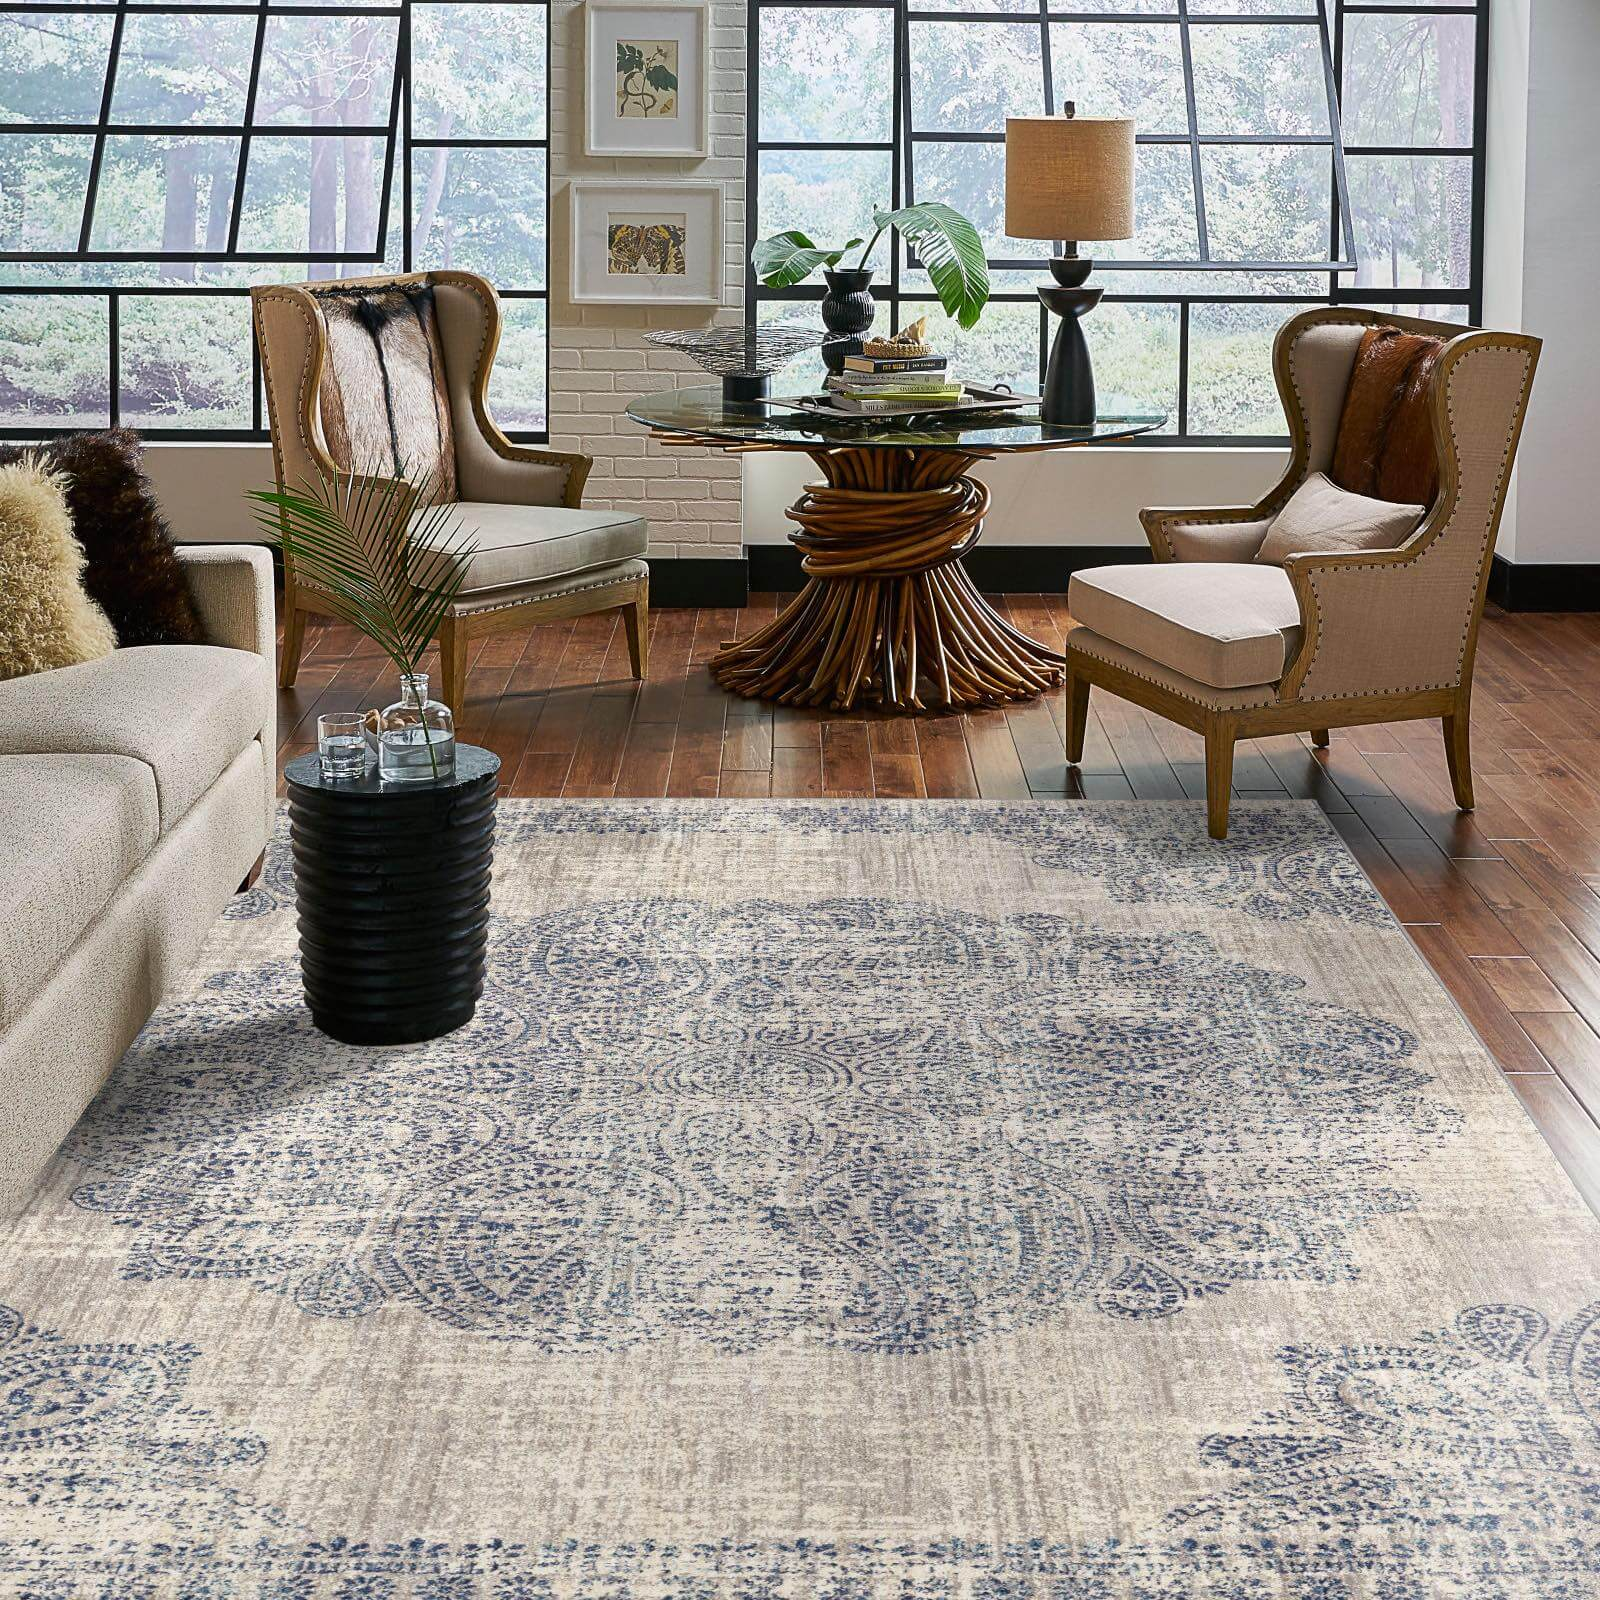 Area Rug in living room | Great Floors